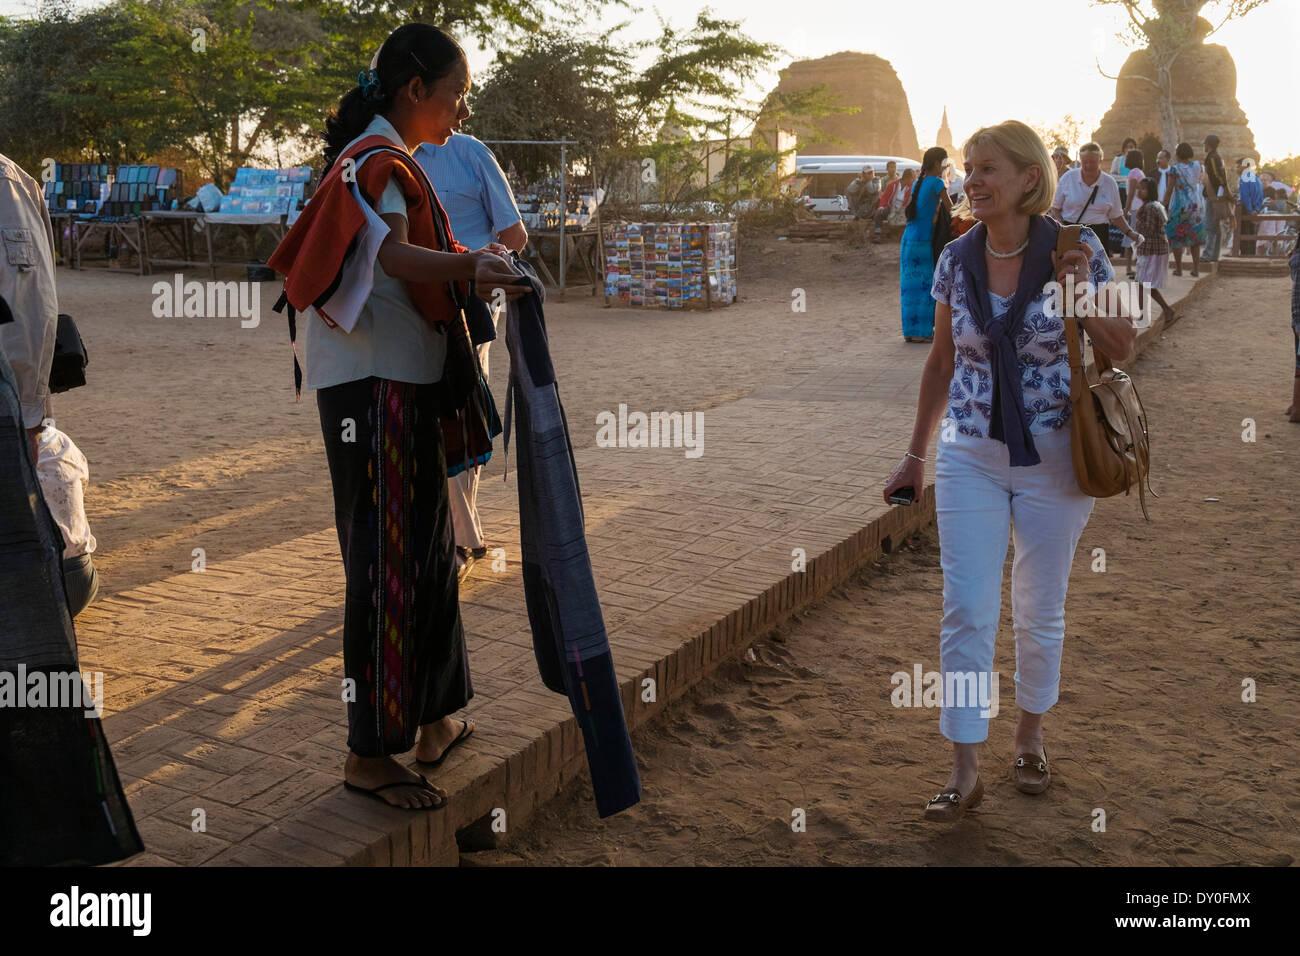 Tourists at Shwesandaw pagoda, Old Bagan, Myanmar, Asia - Stock Image